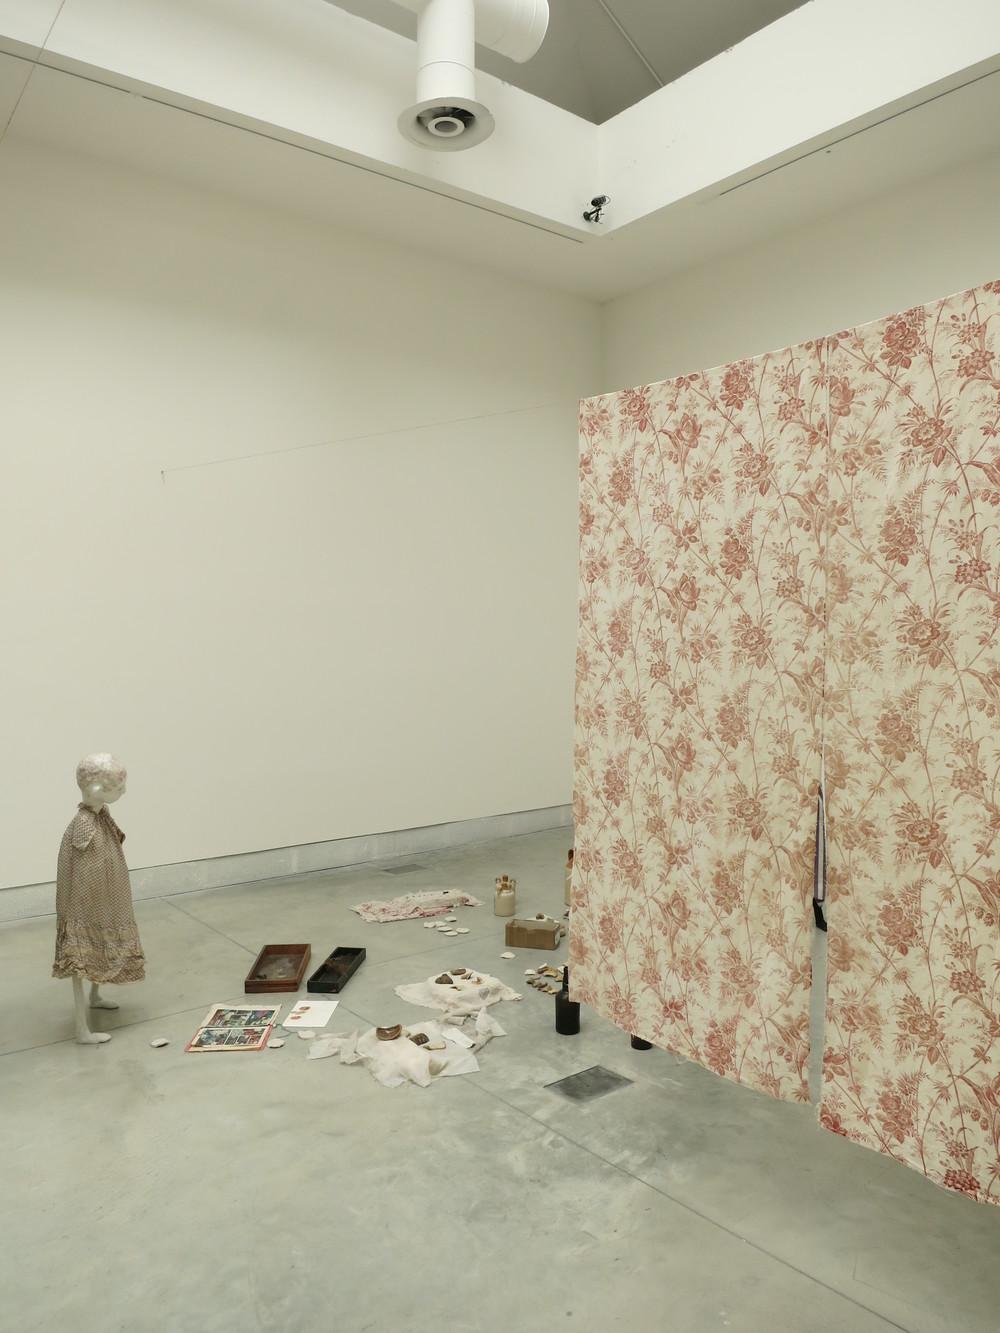 Cathy Wilke's installation in the 55th Venice Biennale 2013